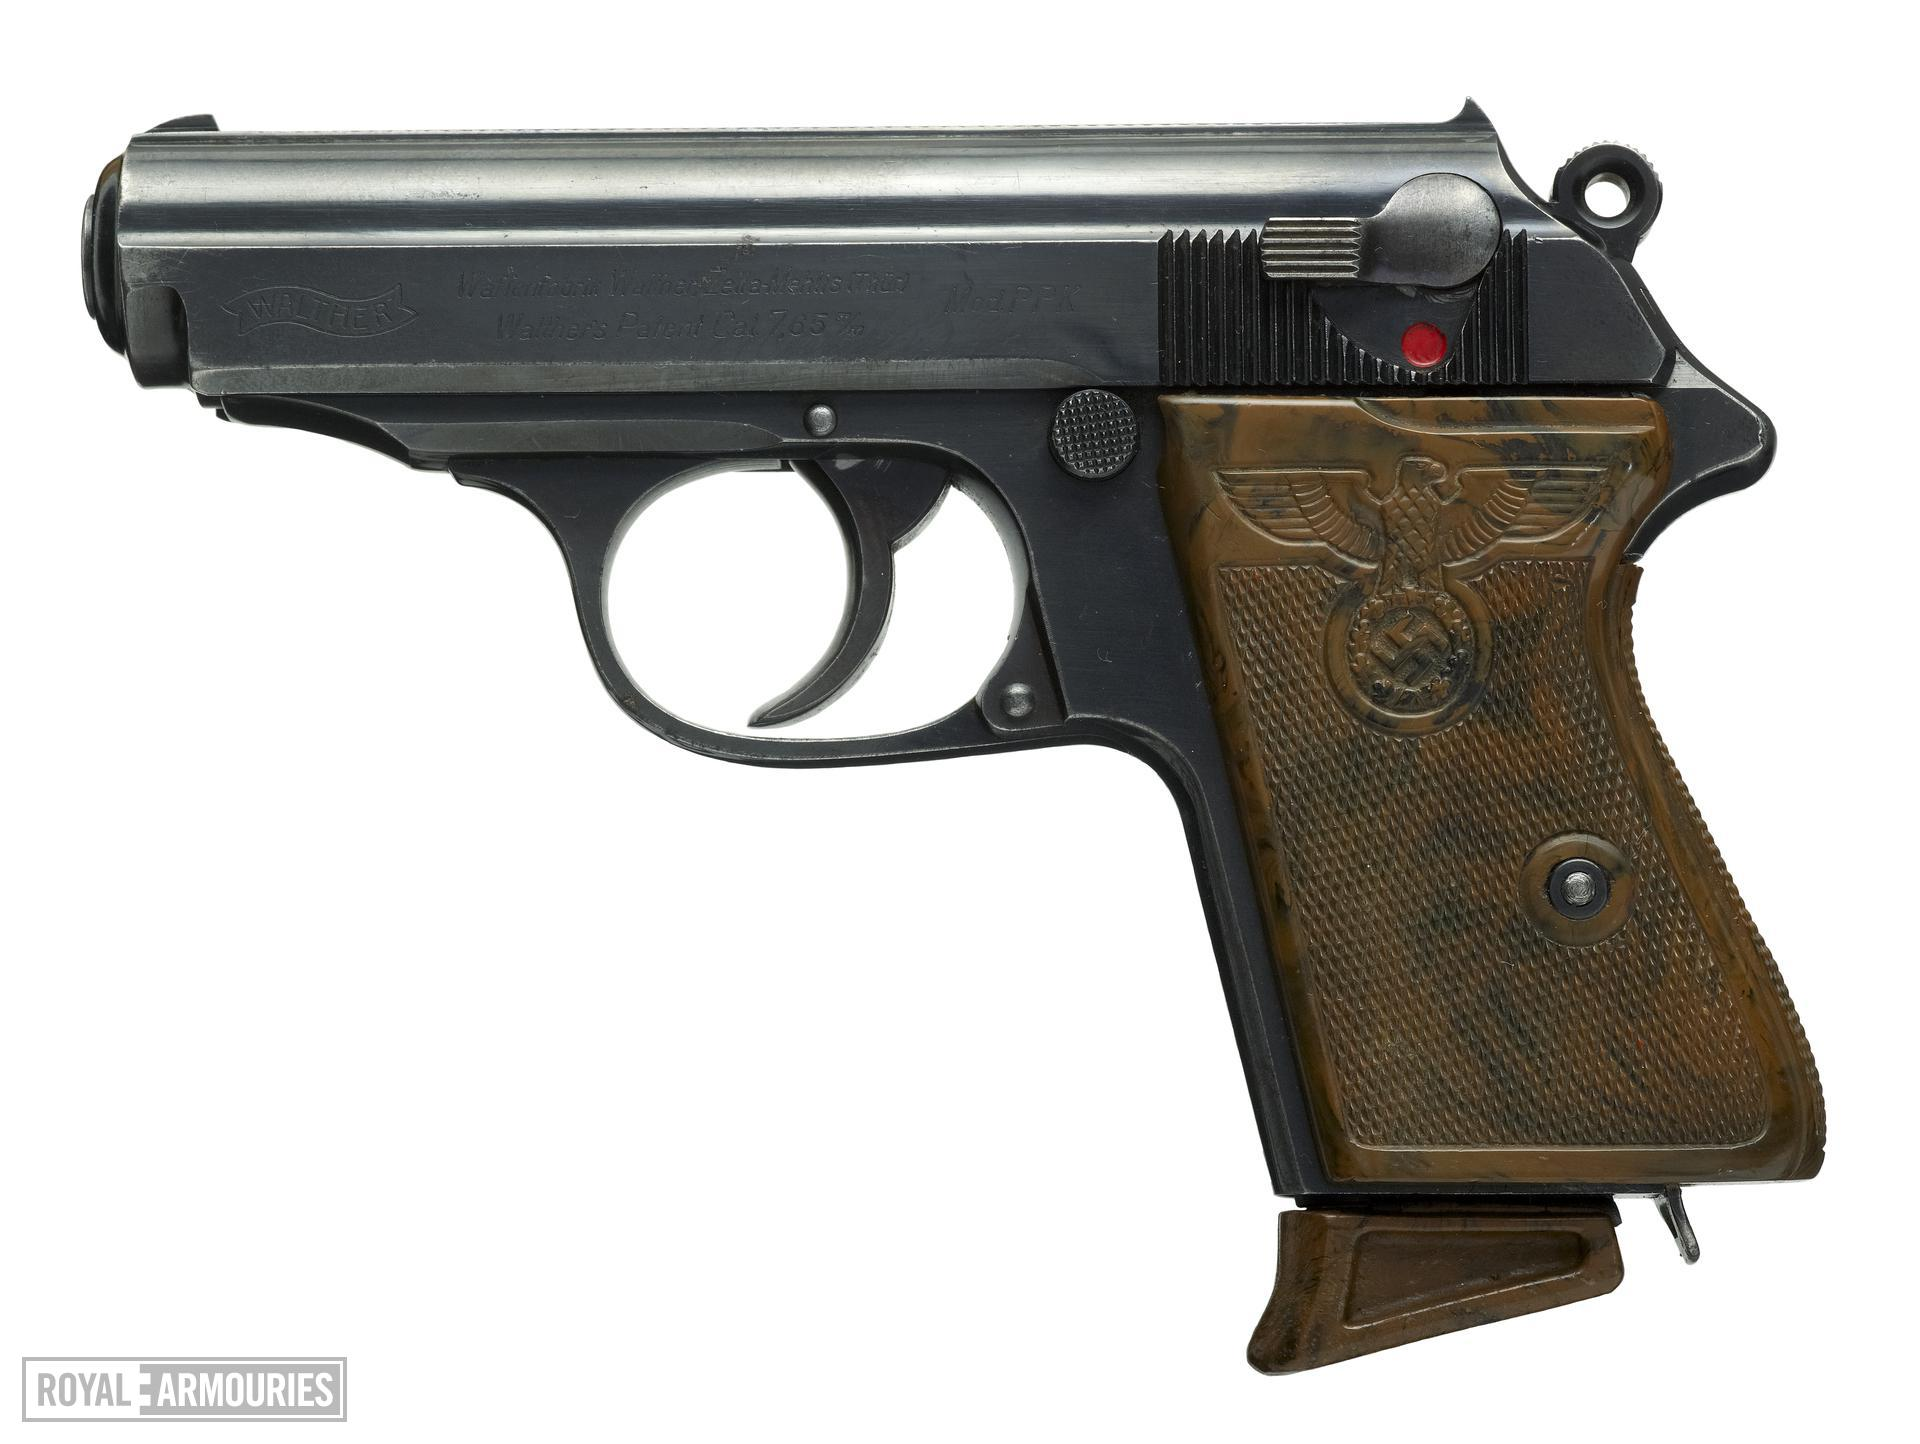 Centrefire self-loading pistol - Walther Model PPK